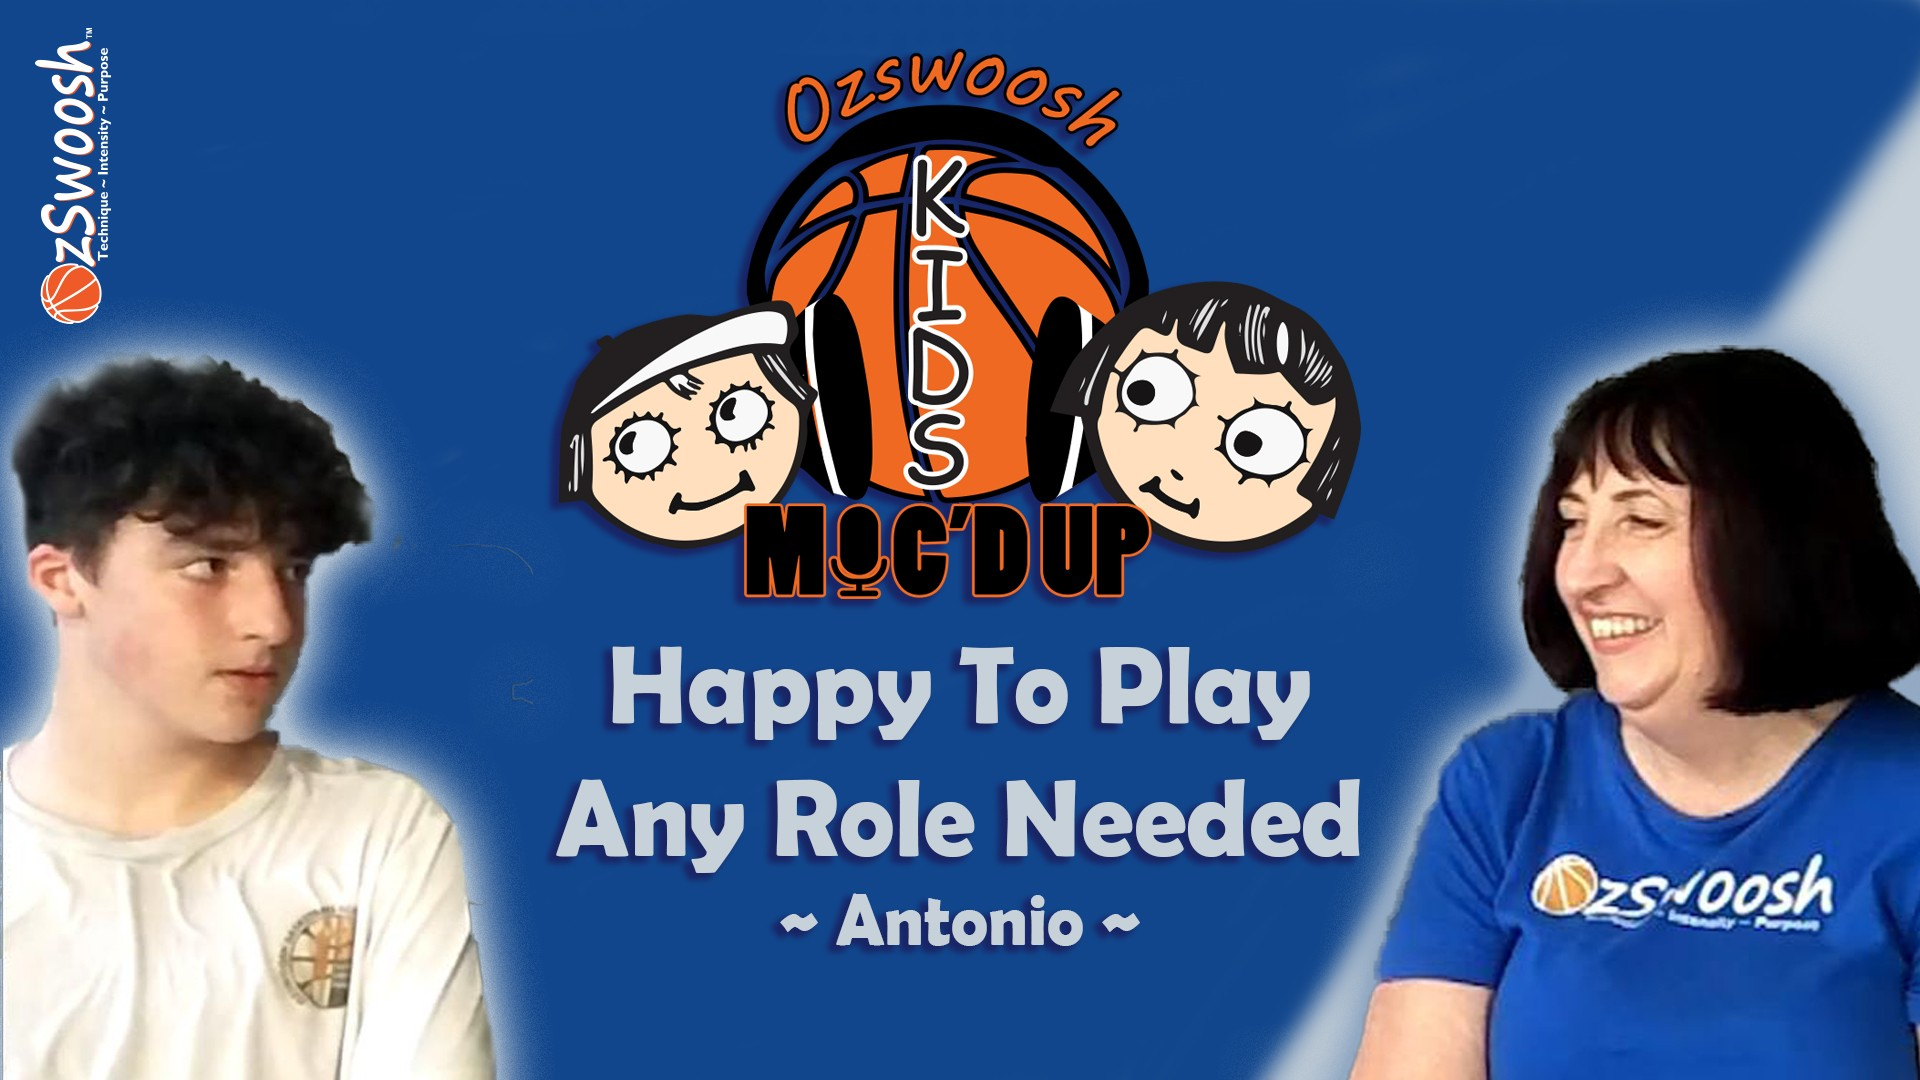 Basketball Team Role - OzSwoosh Academy Antonio